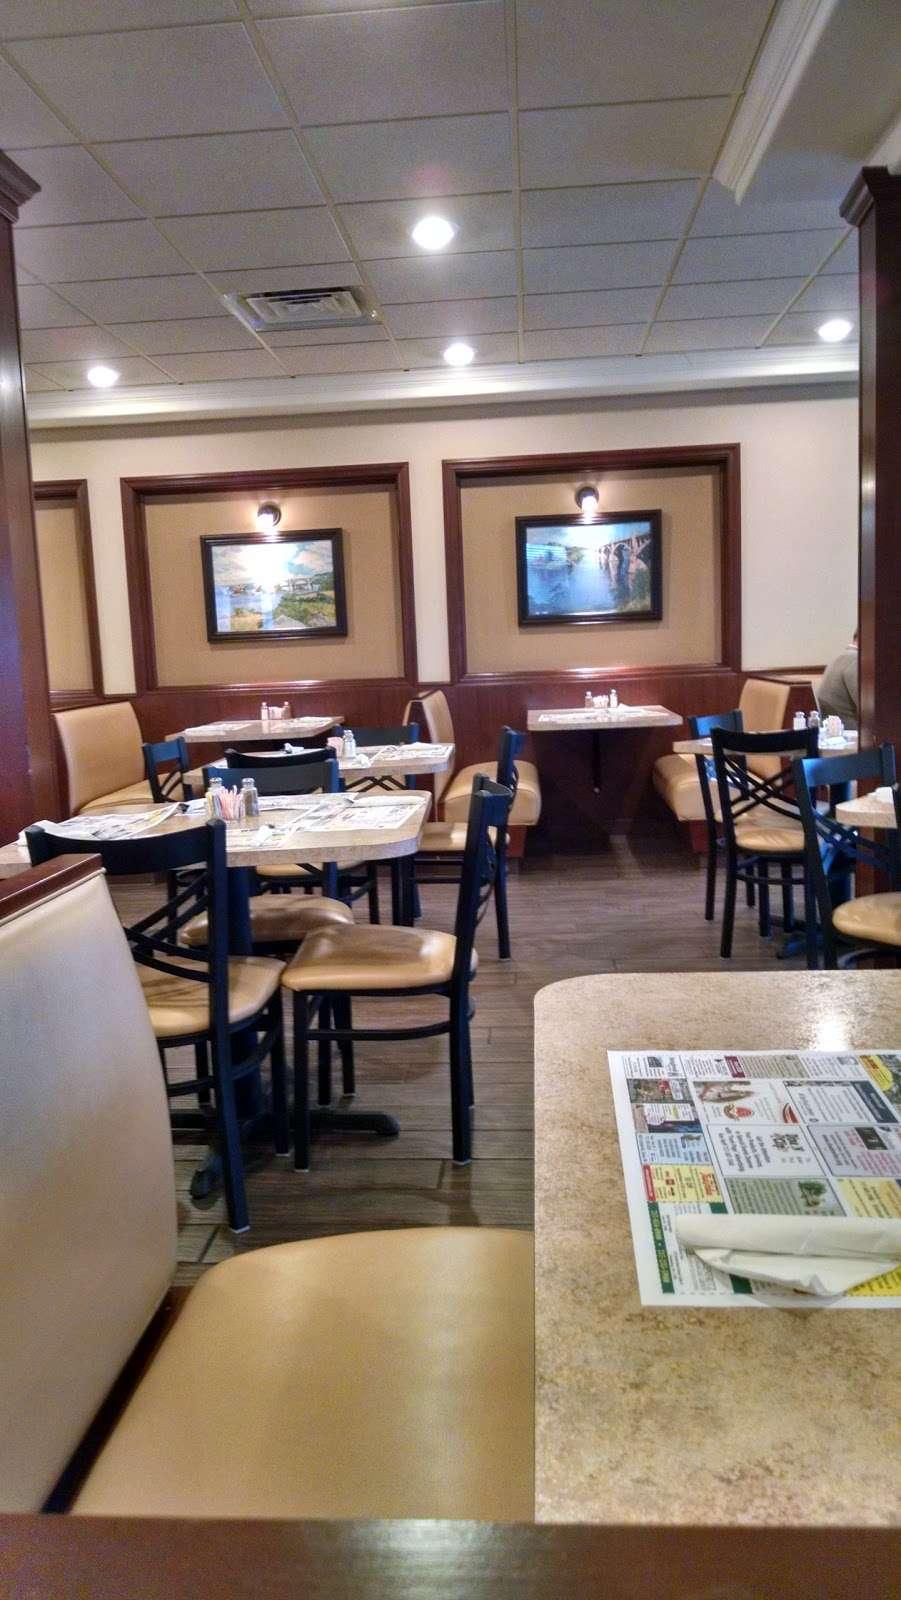 Rivertowne Restaurant & Bar - restaurant  | Photo 10 of 10 | Address: 960 Hellam St, Wrightsville, PA 17368, USA | Phone: (717) 252-3184